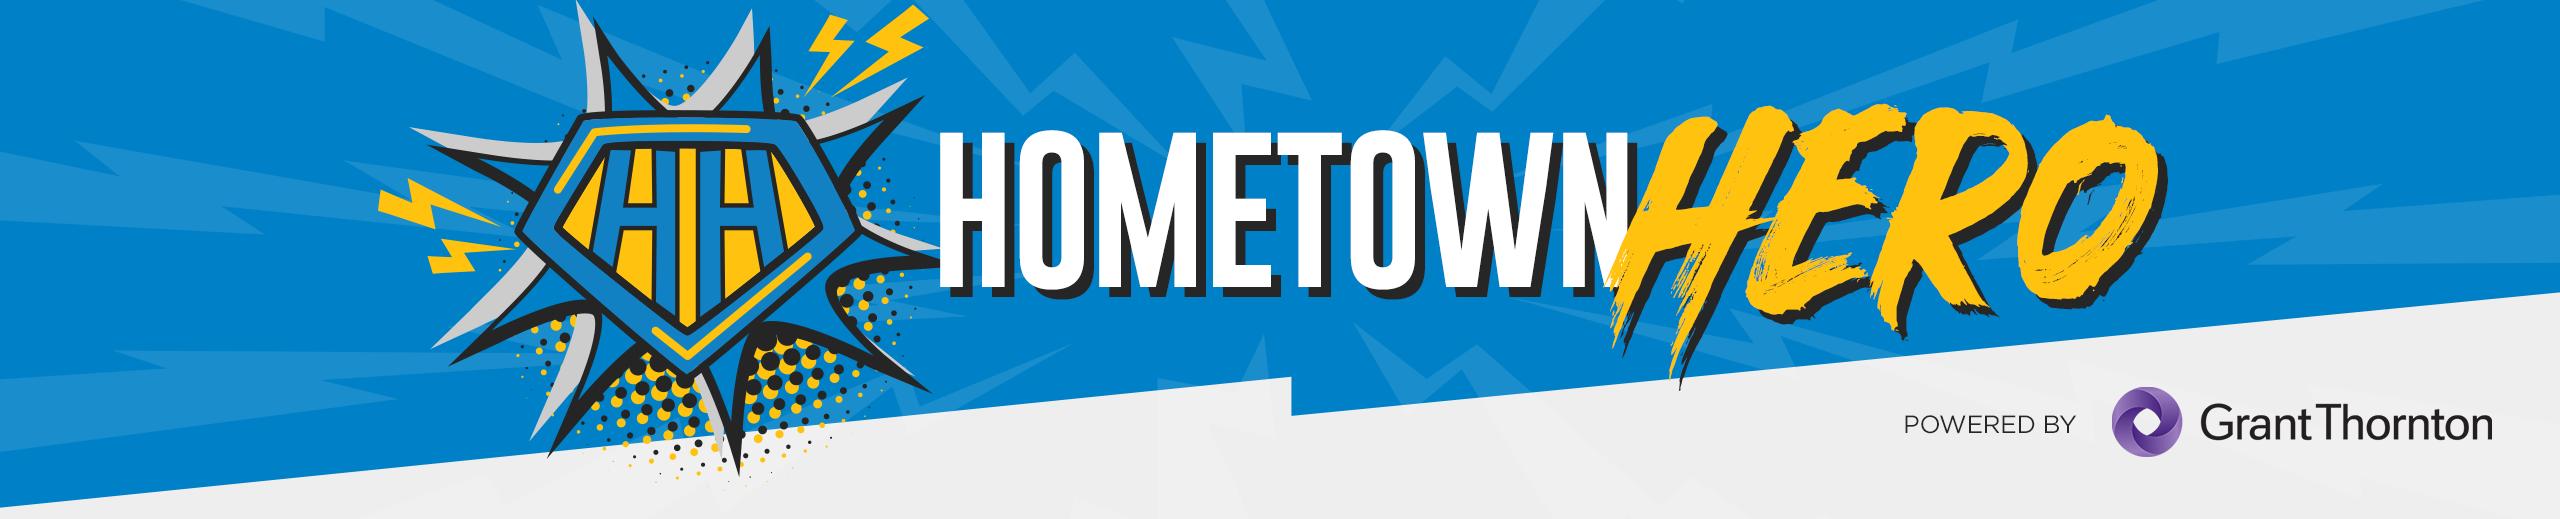 201025_Hometown_Hero_Header